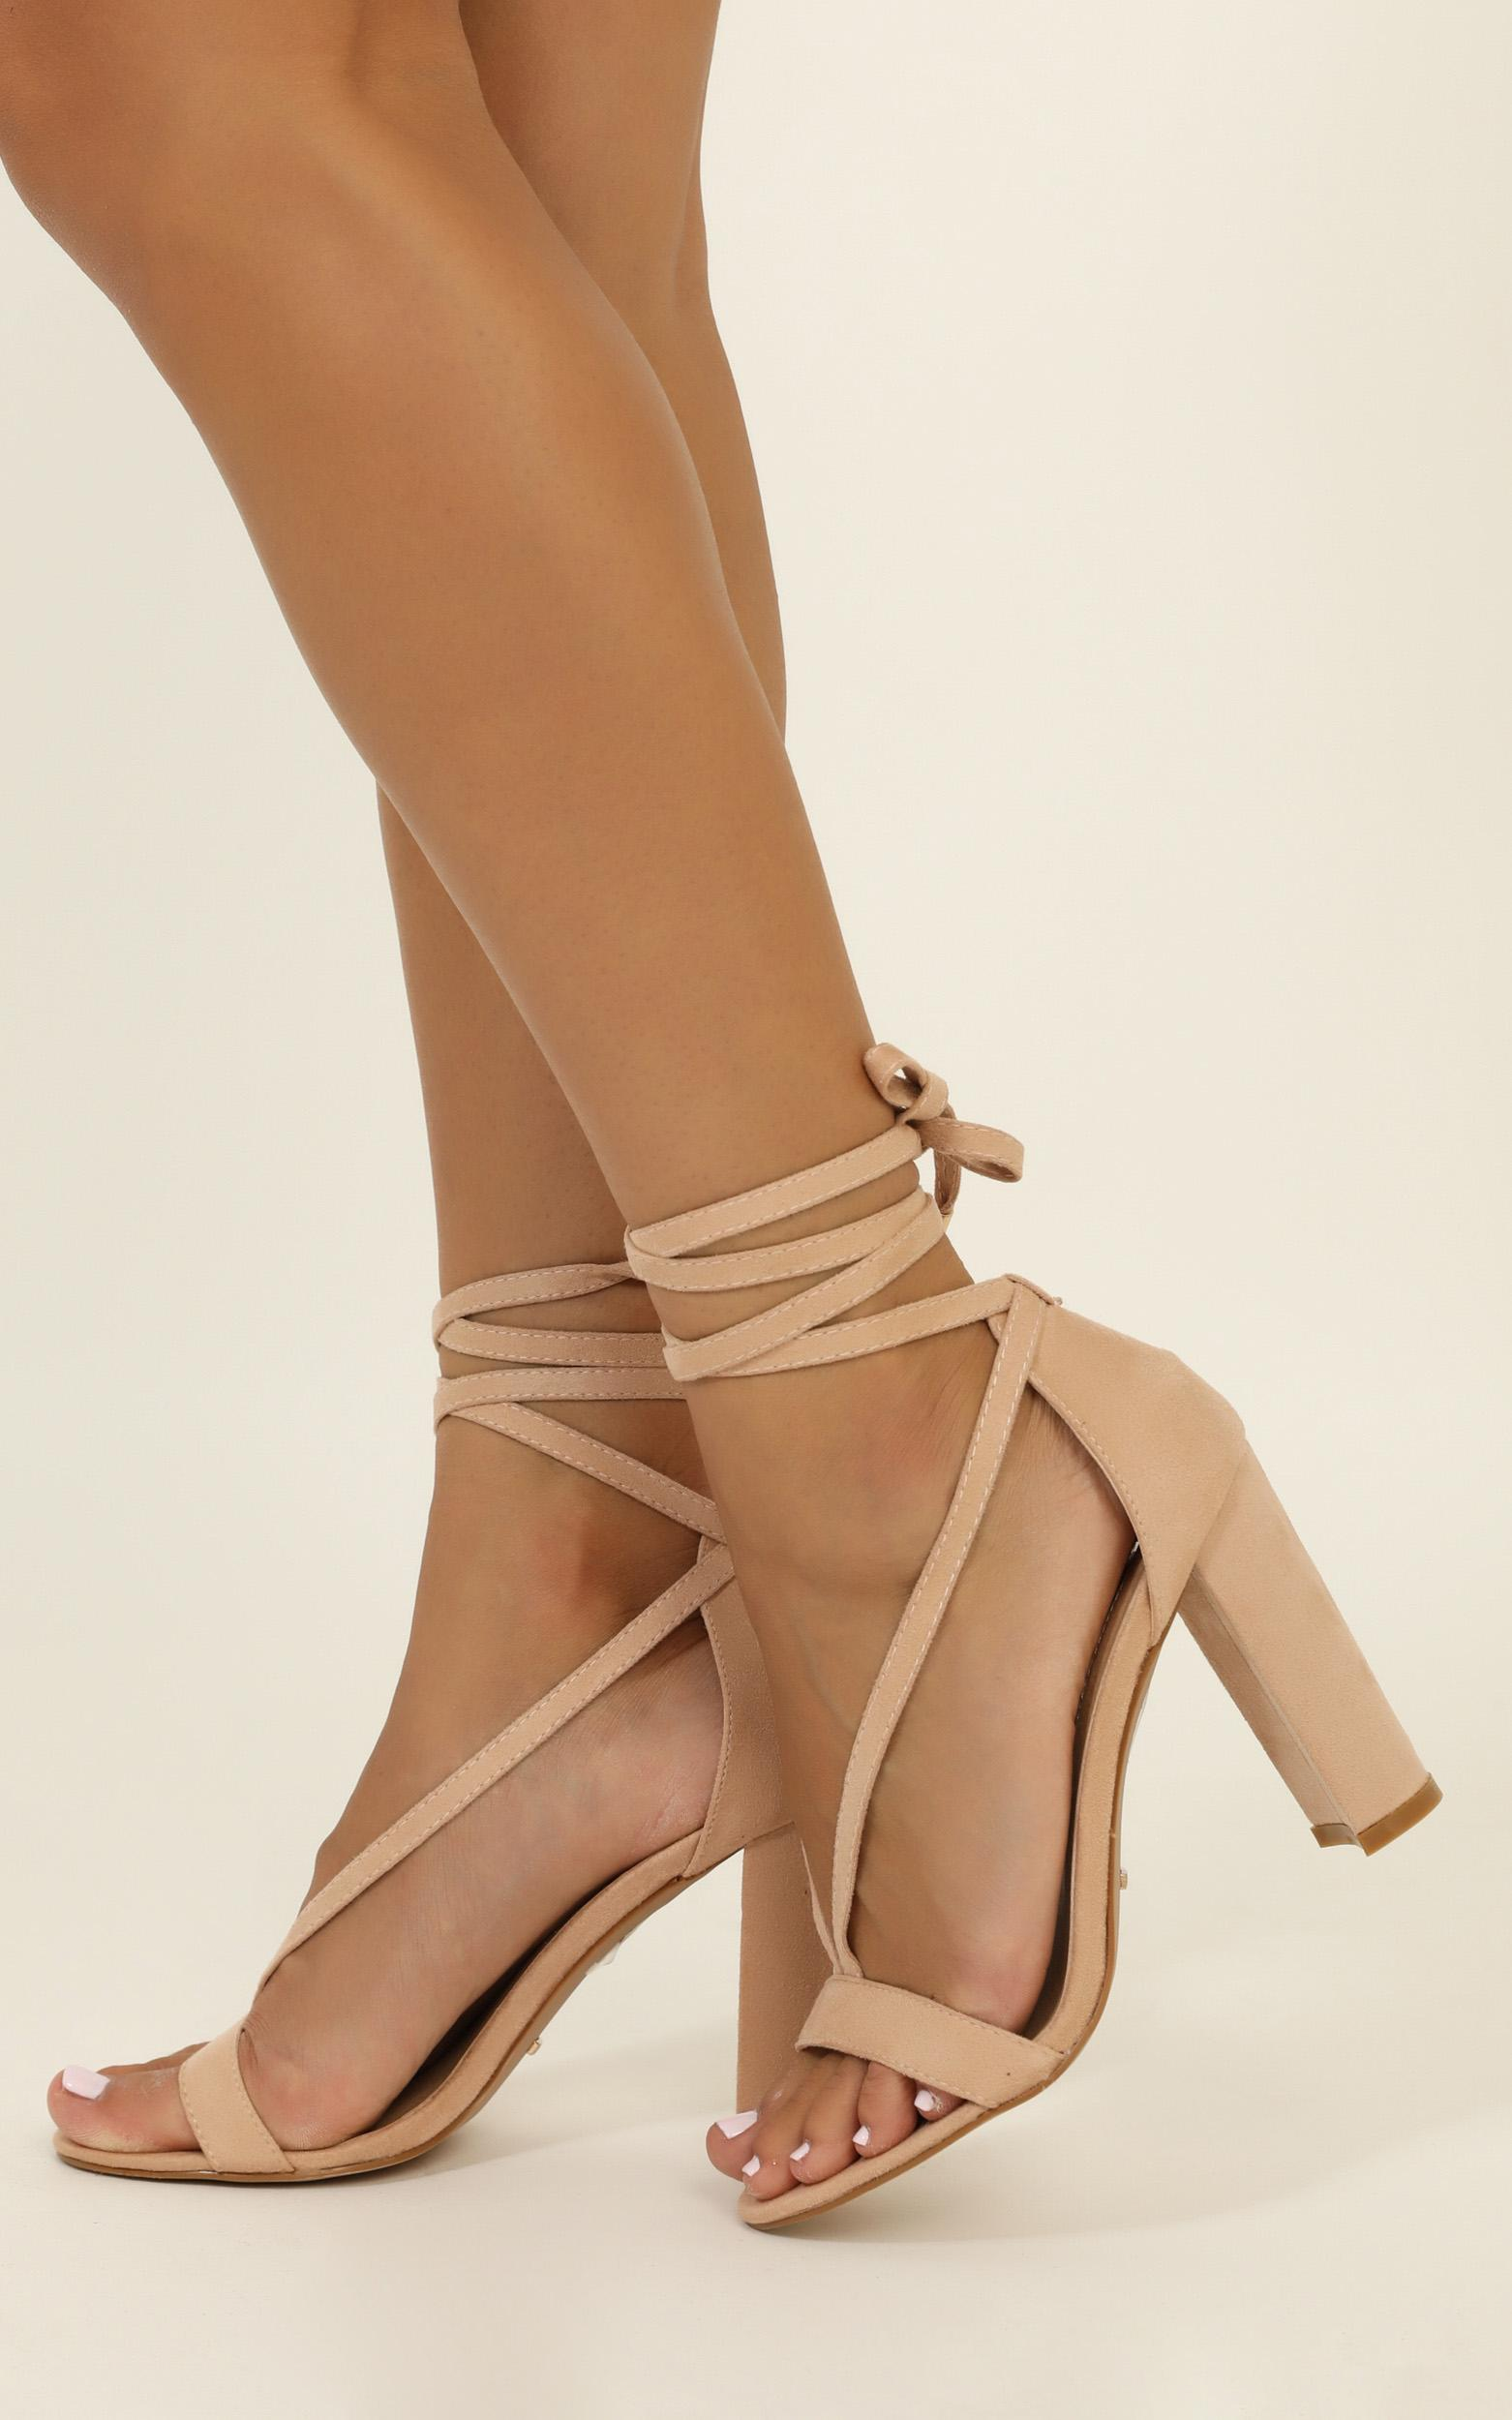 Billini - Juno heels in blush micro - 10, Blush, hi-res image number null